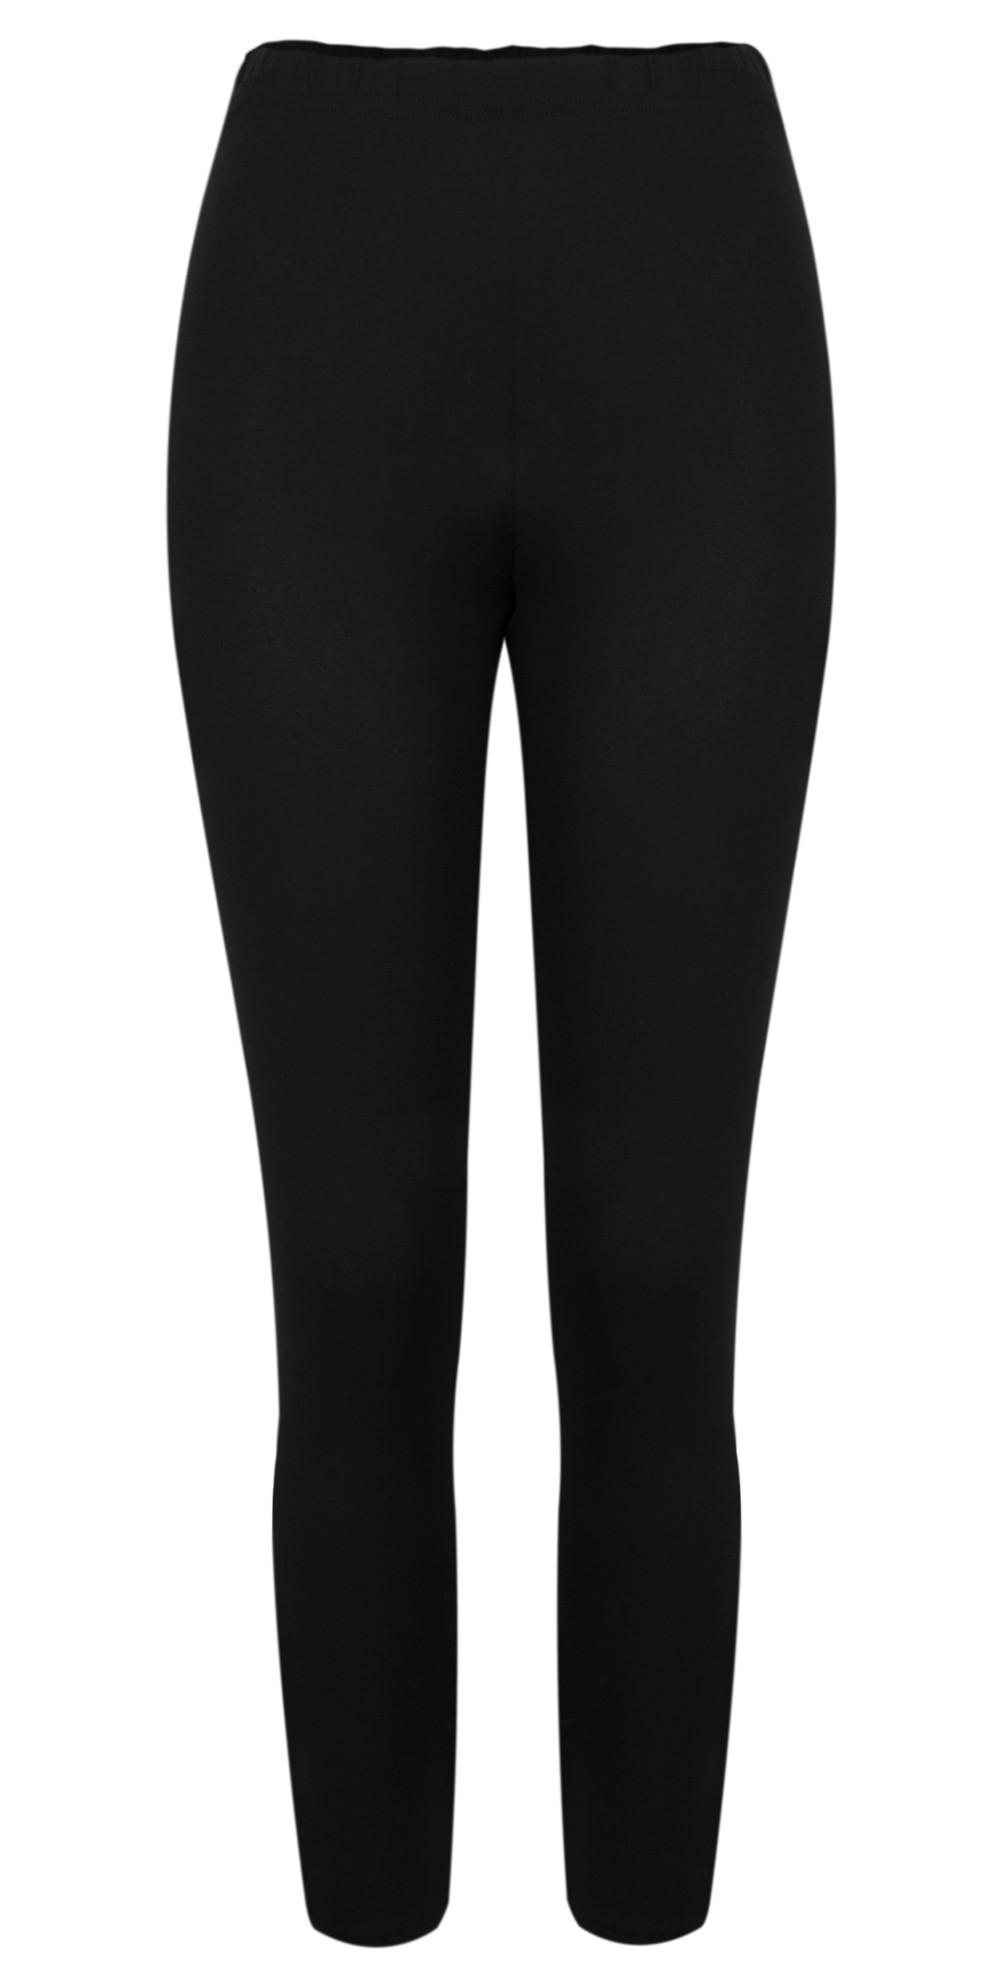 Pia Basic Legging main image